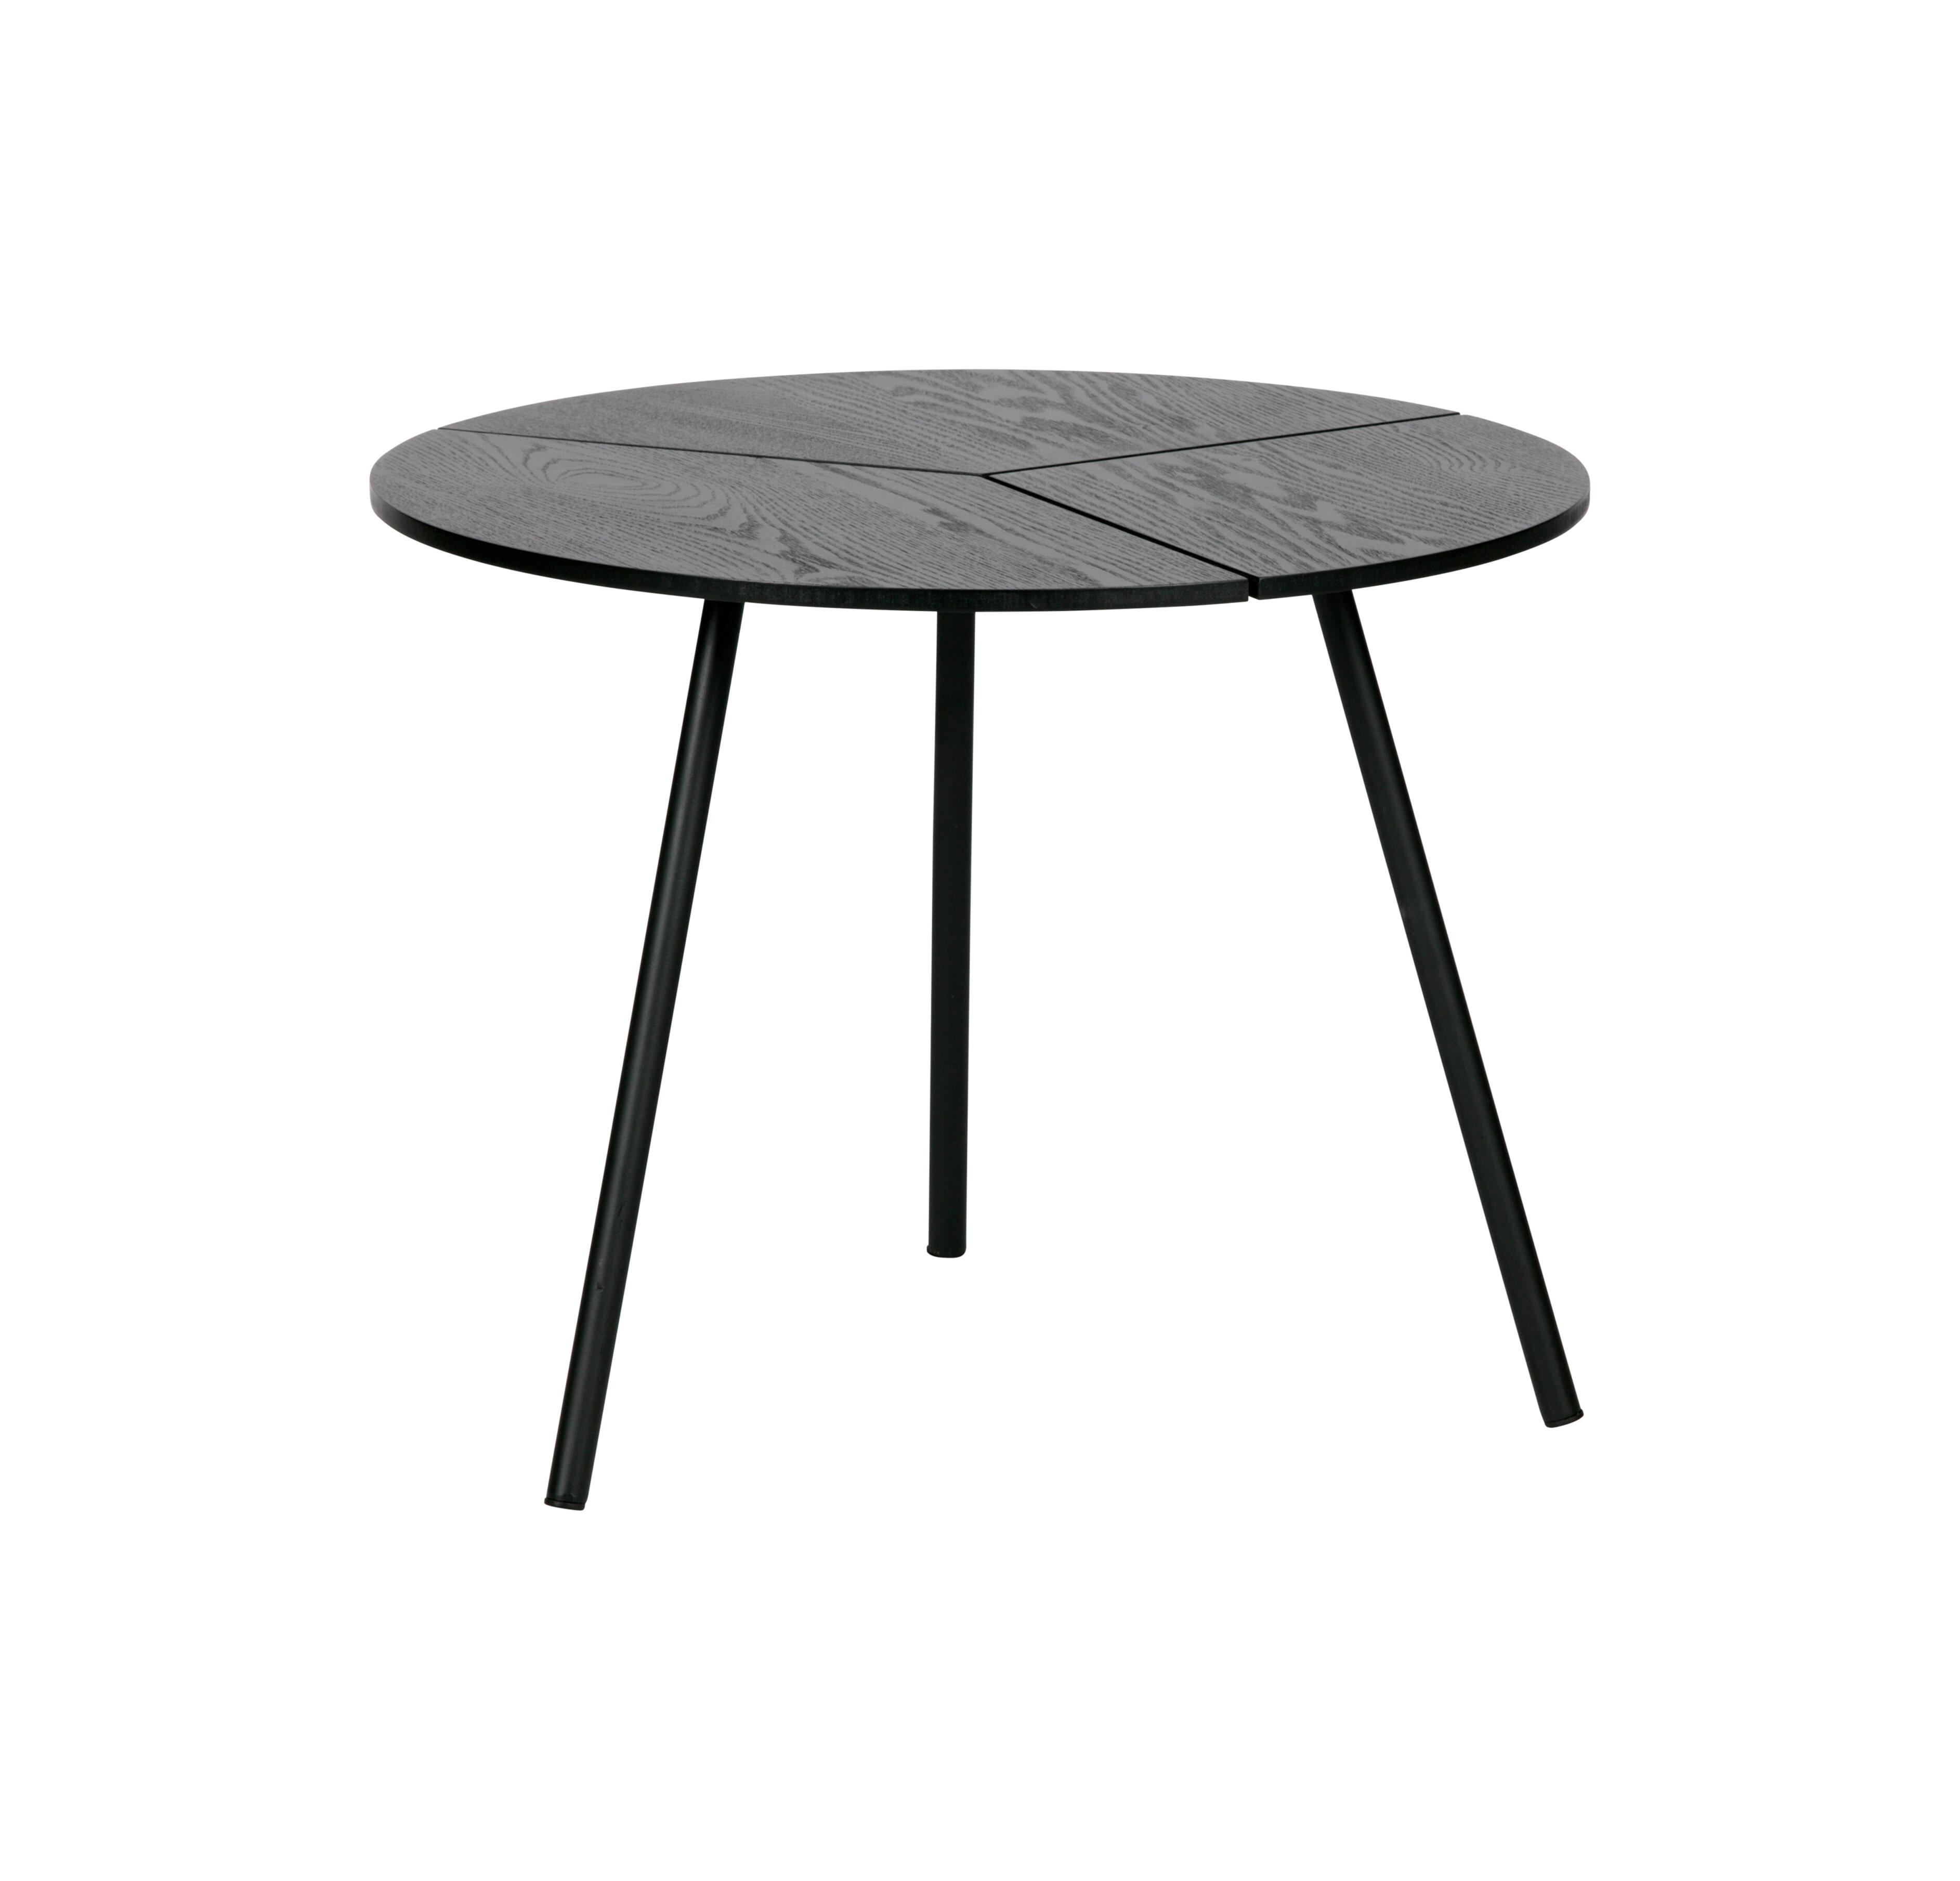 WOOOD Bijzettafel 'Rodi' 48cm, kleur Zwart